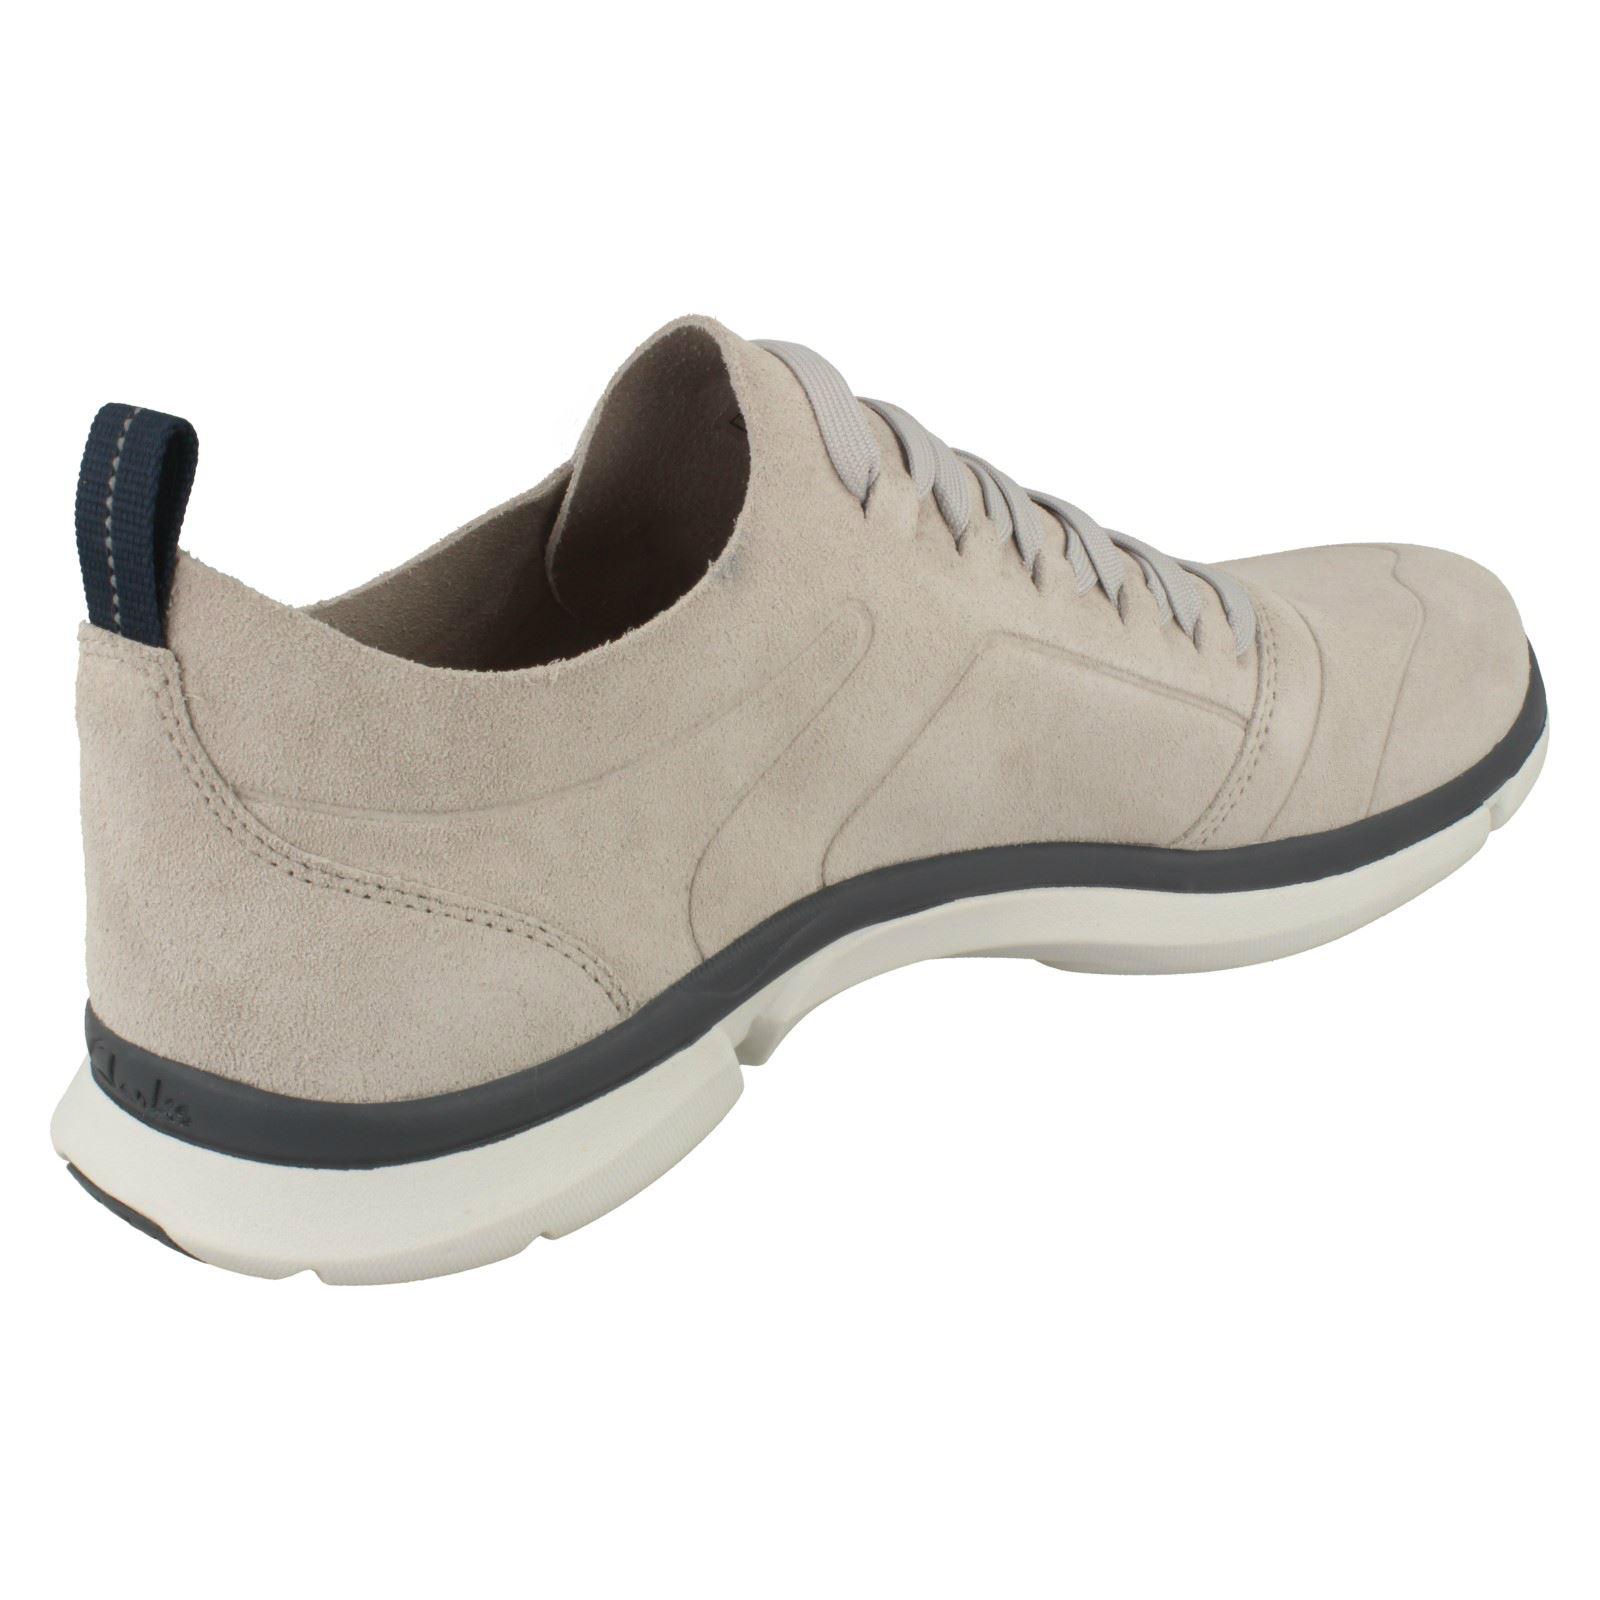 de triken Clarks claro gris casuales hombre zapatos gris encaje para U4qA65wq